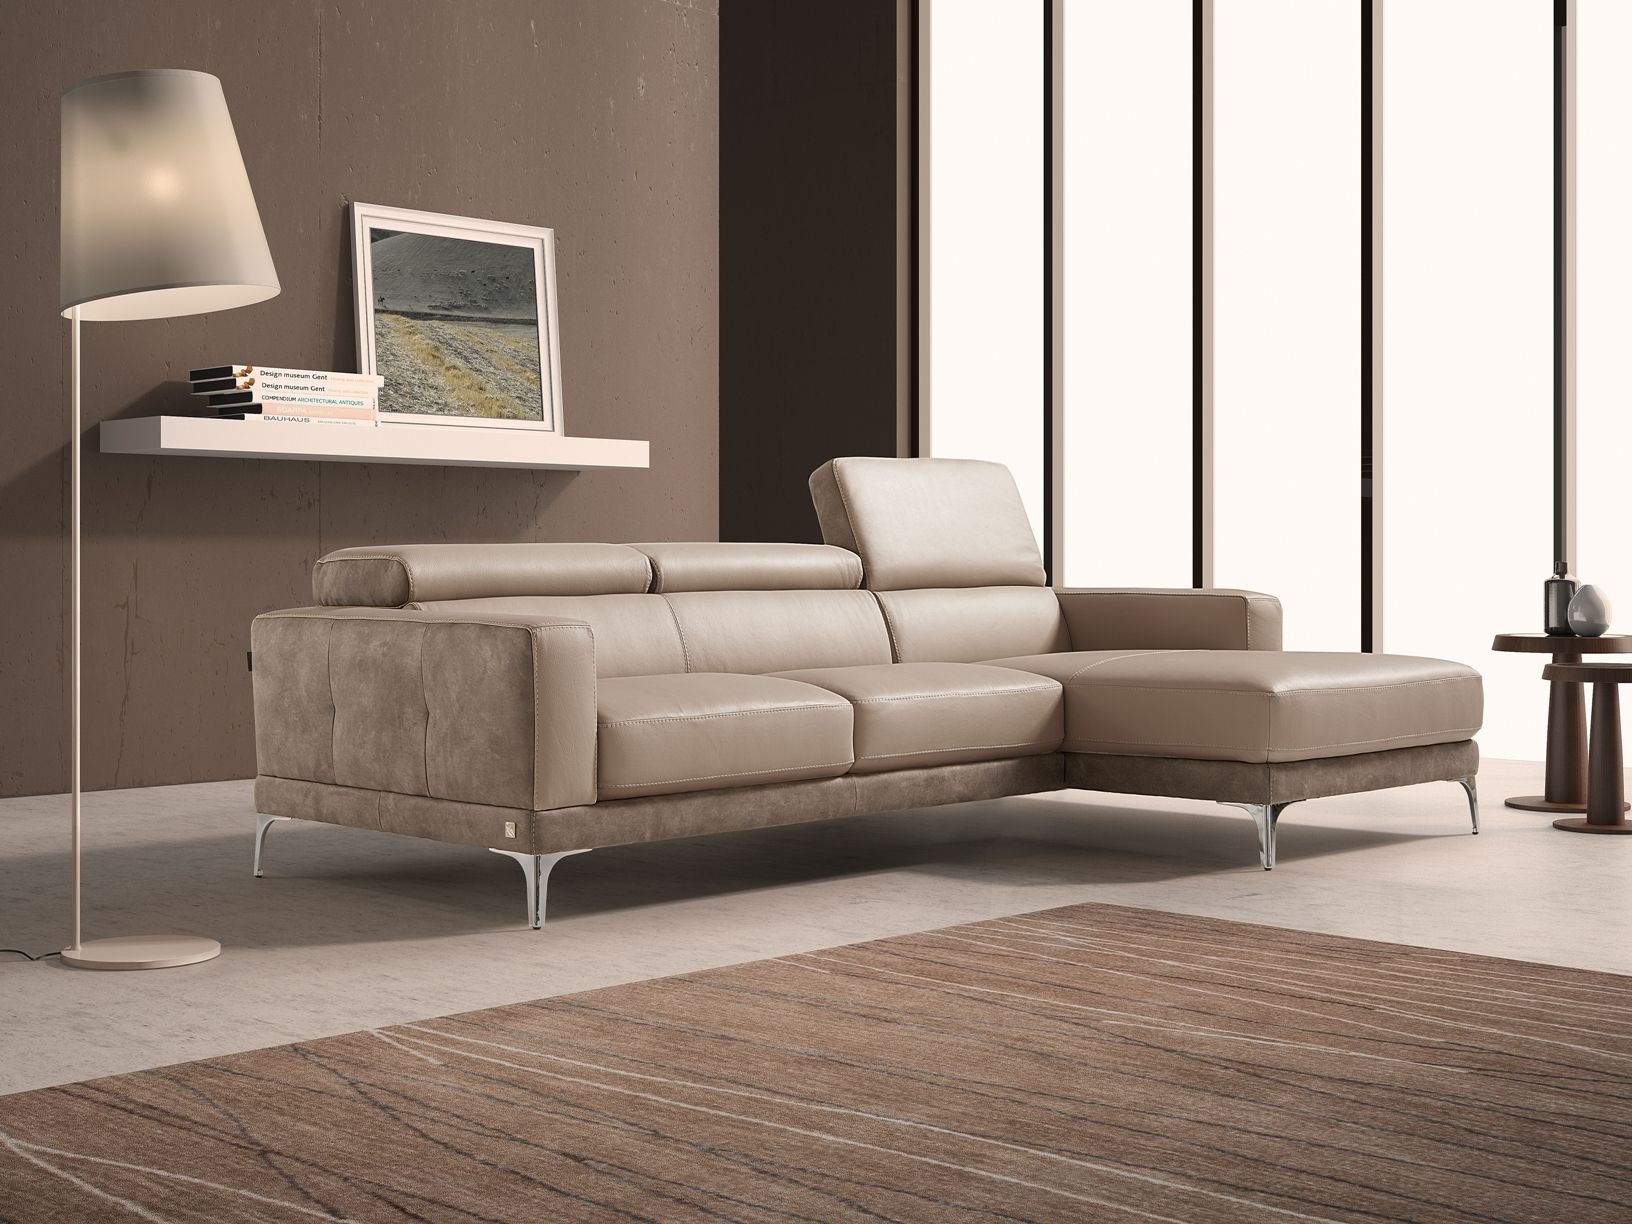 Ecointeriors Ecoexclusive Egoitaliano Couch Italian Design Dublin Santry Dunlaoghaire Couch Design Home